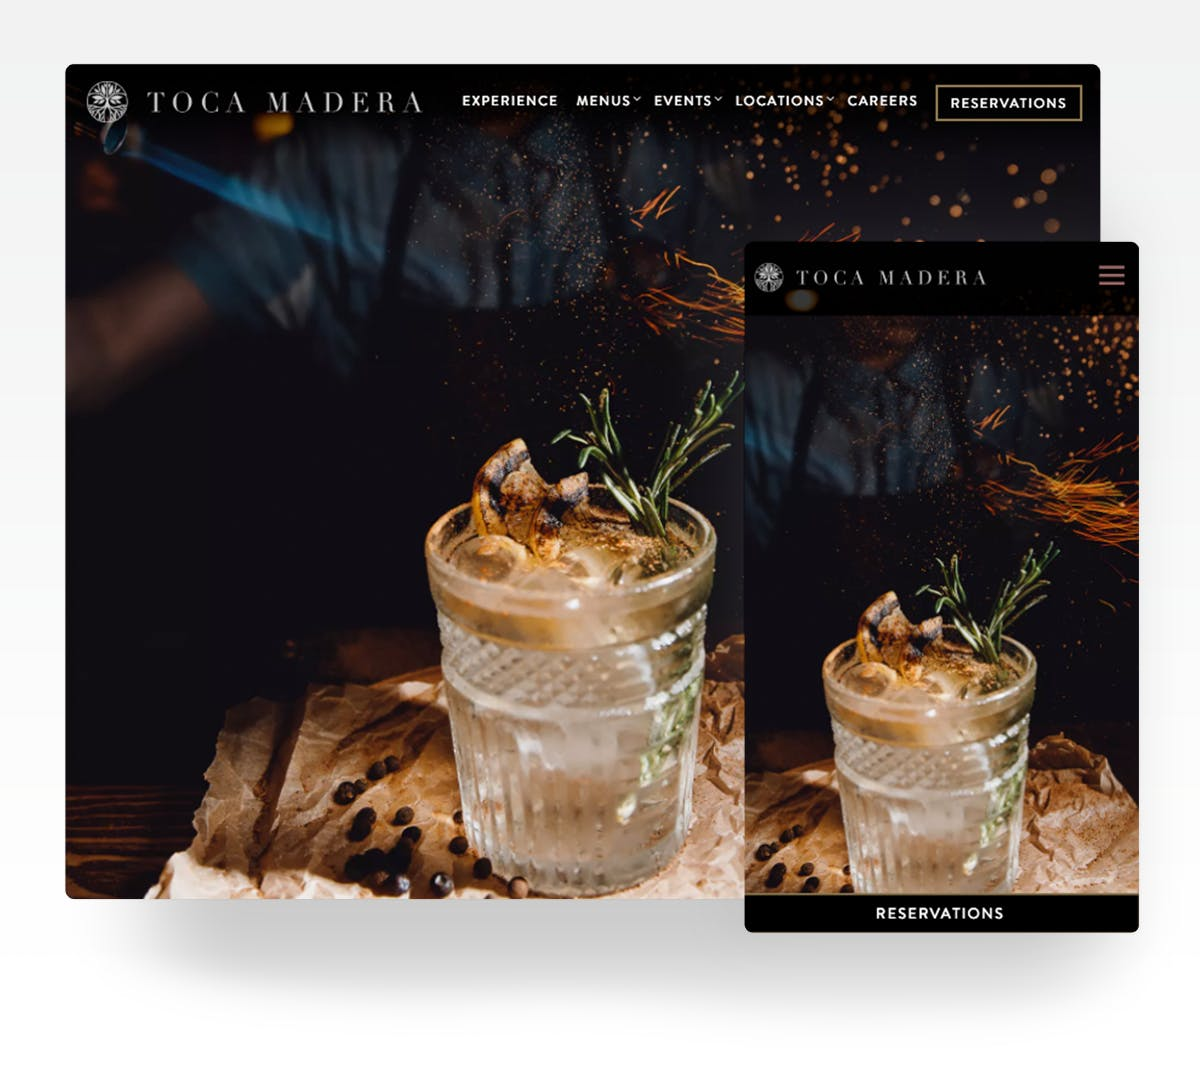 Toca Madera website